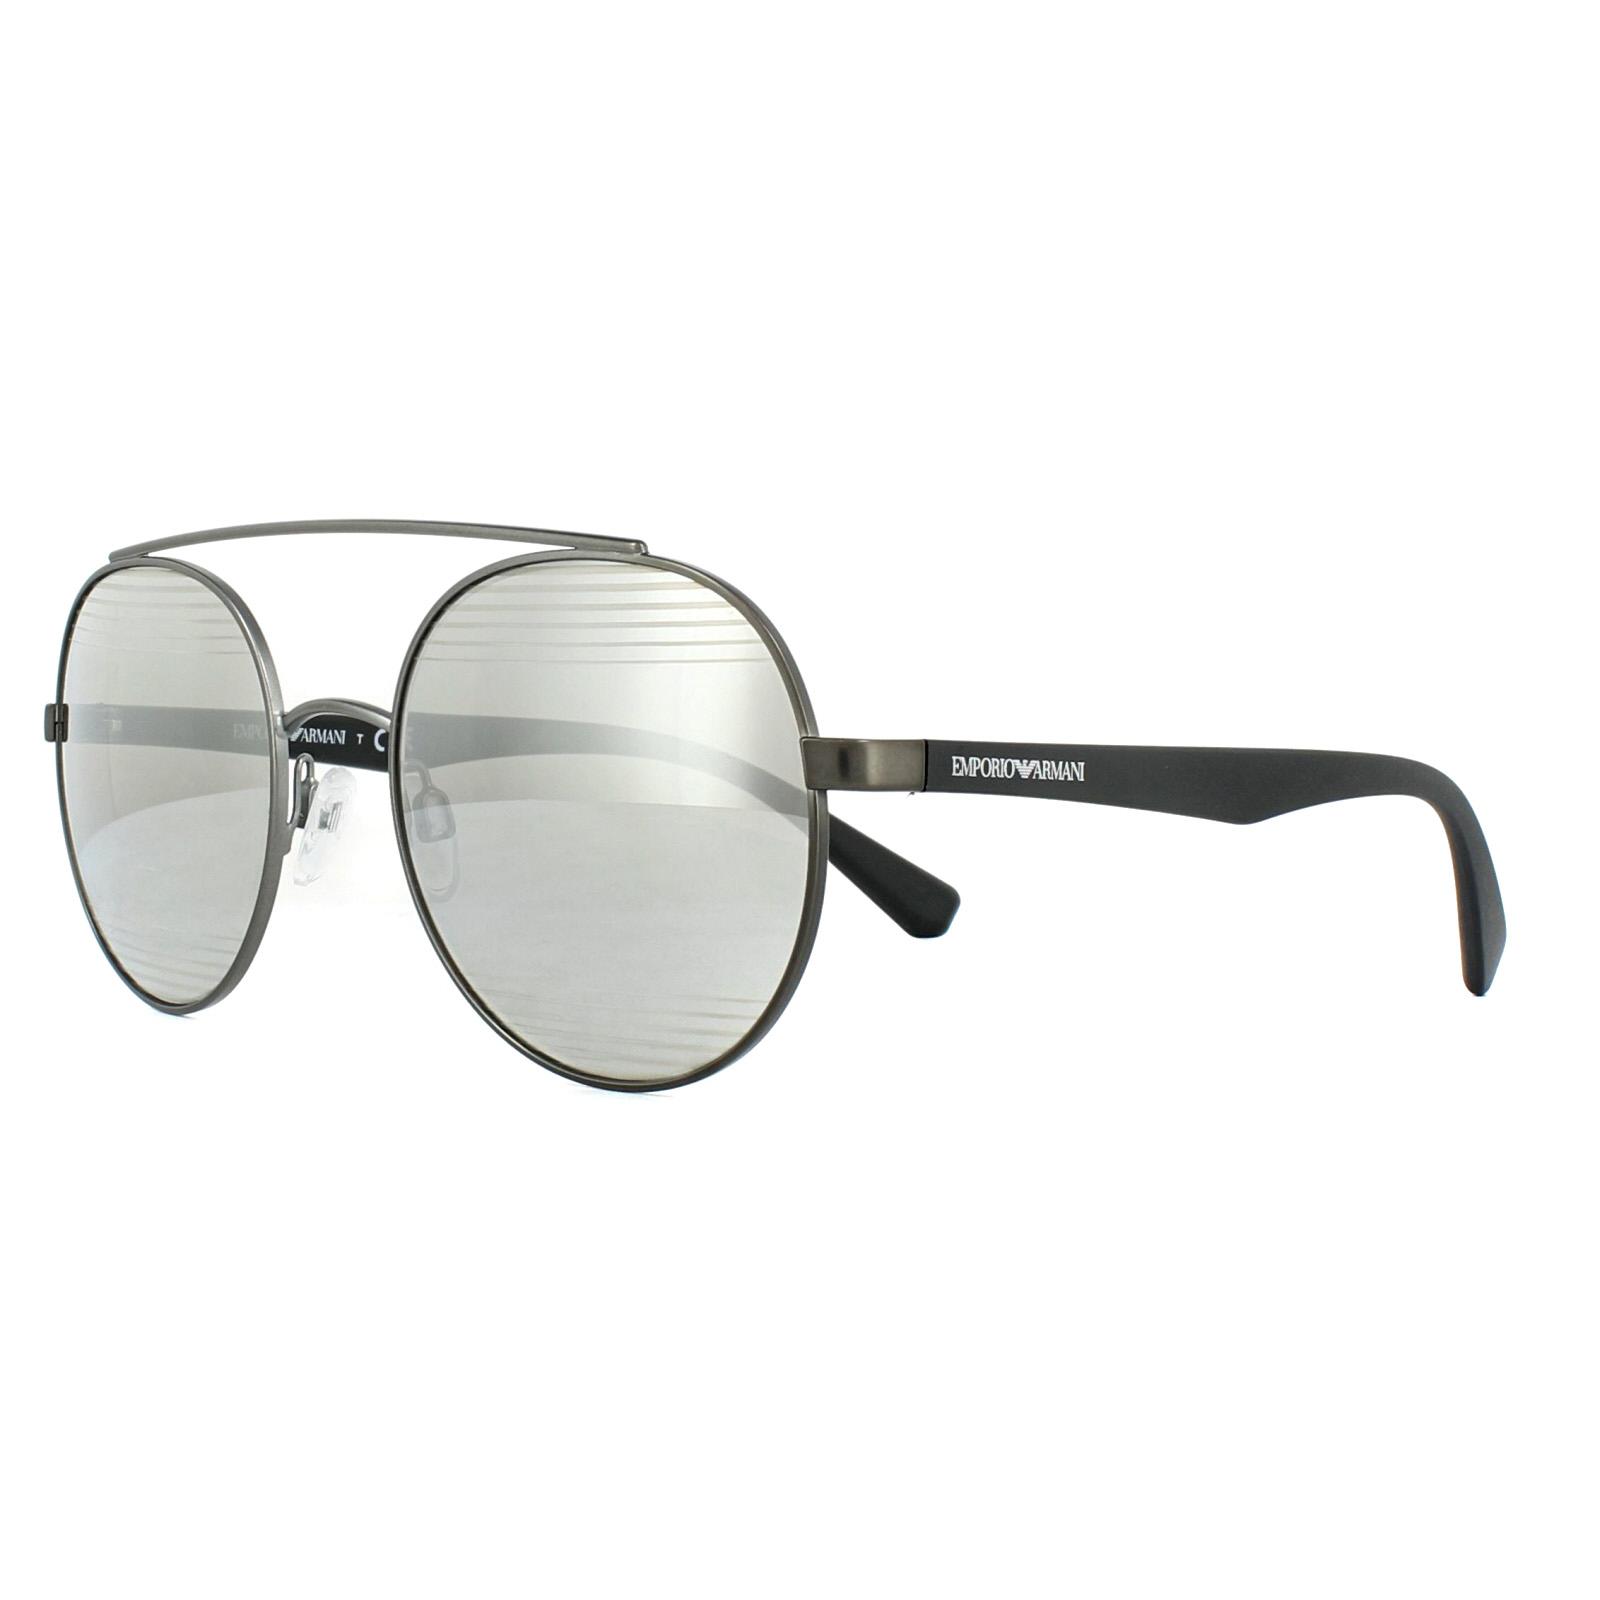 22d0241939b Sentinel Emporio Armani Sunglasses EA2051 30106G Matt Gunmetal Light Grey  Silver Mirror